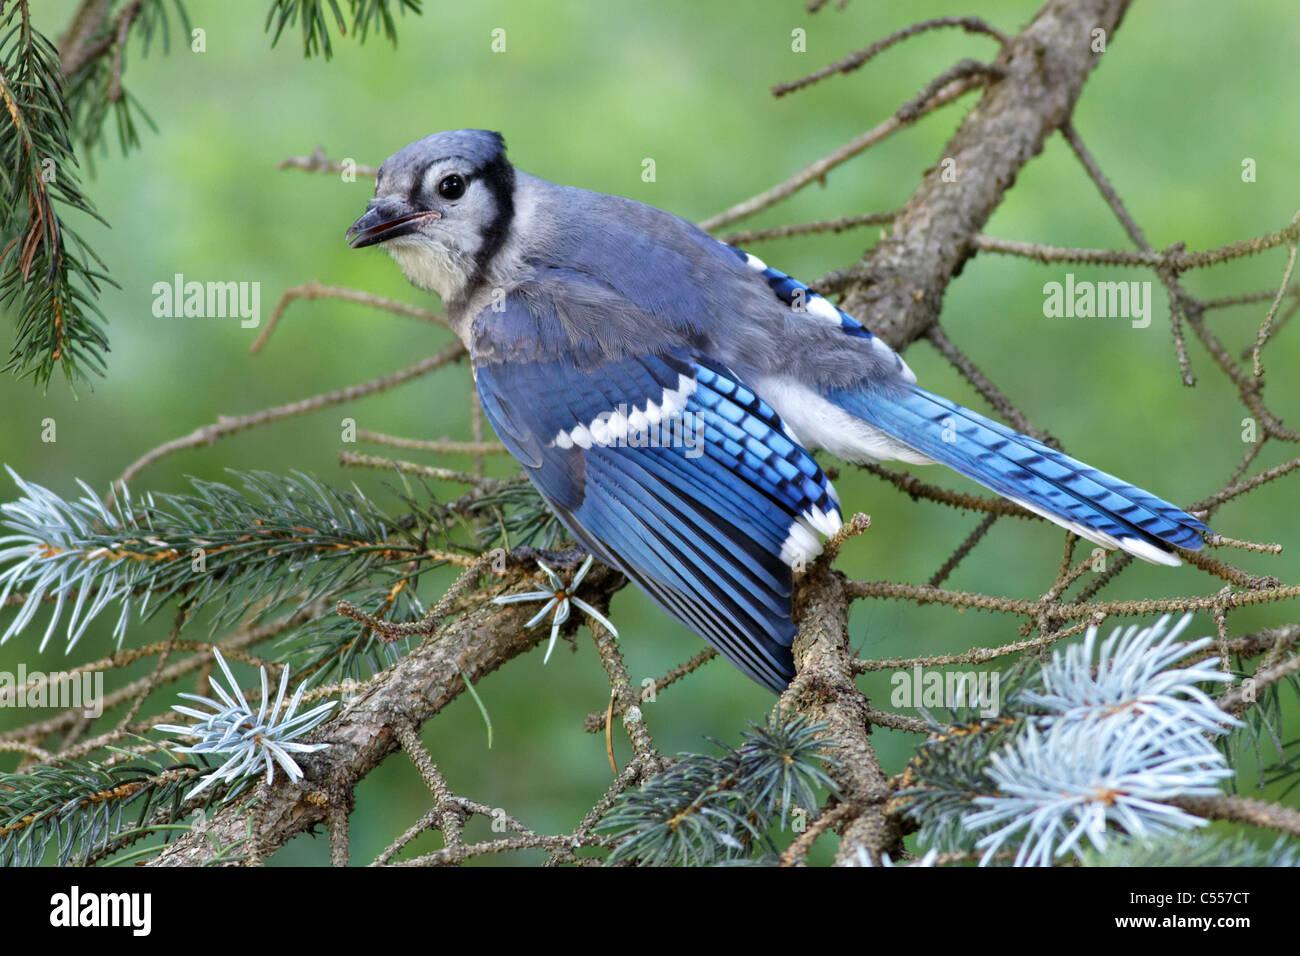 Blue Jay / Geai bleu (Cyanocitta cristata) Stock Photo